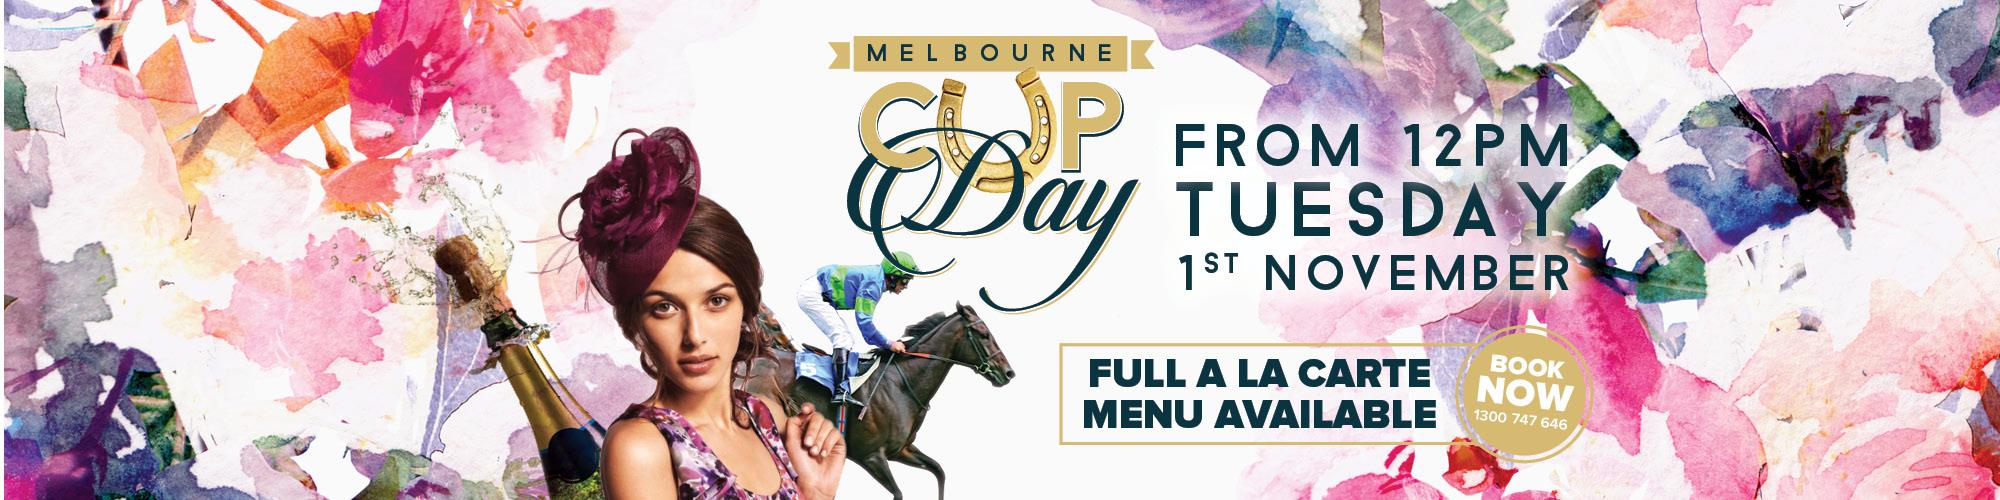 Melbourne-Cup-Luncheon-website-slide-2000x500